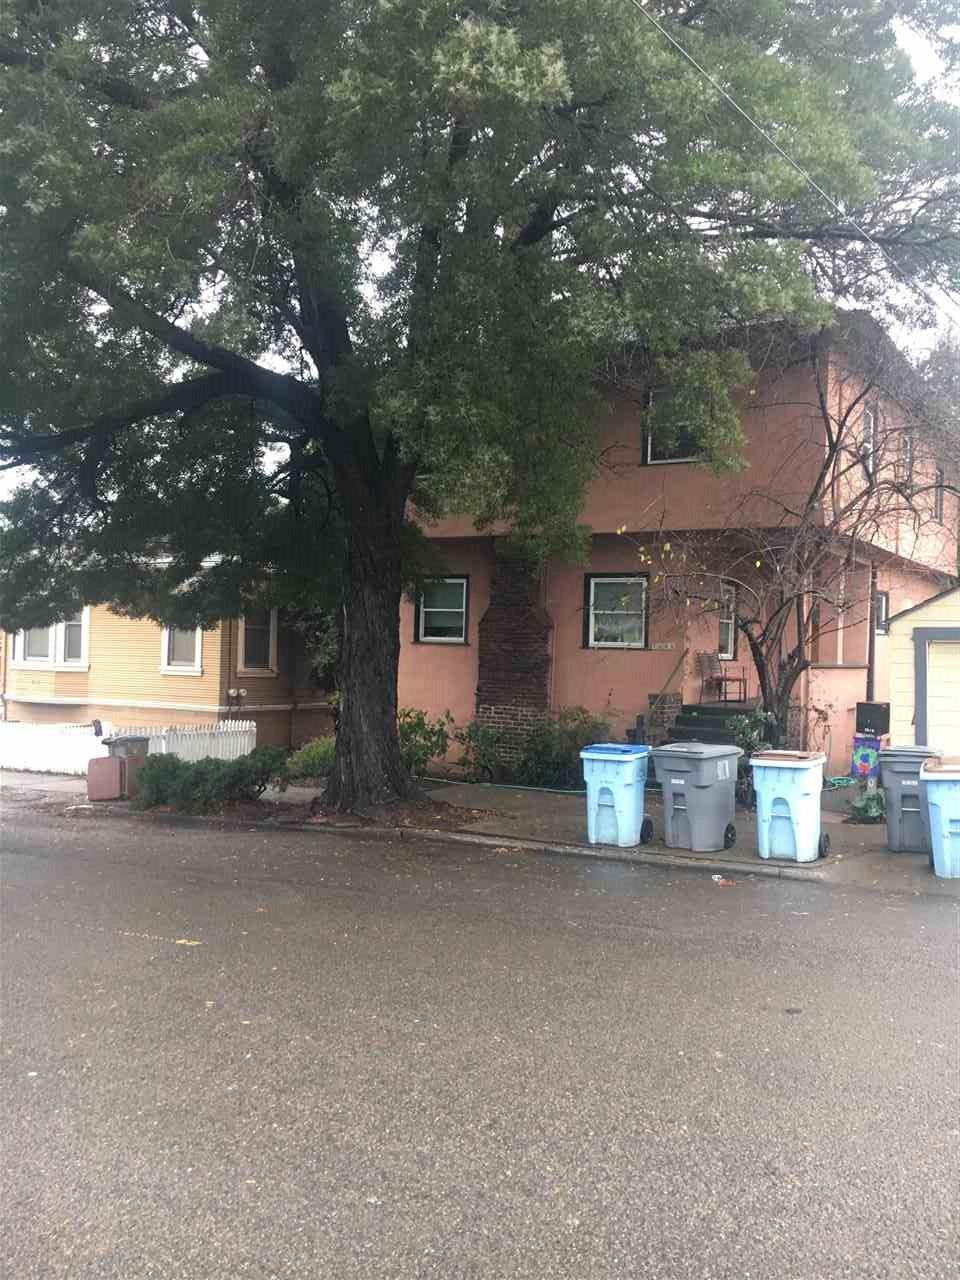 Multi-Family Home for Sale at 2606 Fulton Street 2606 Fulton Street Berkeley, California 94704 United States